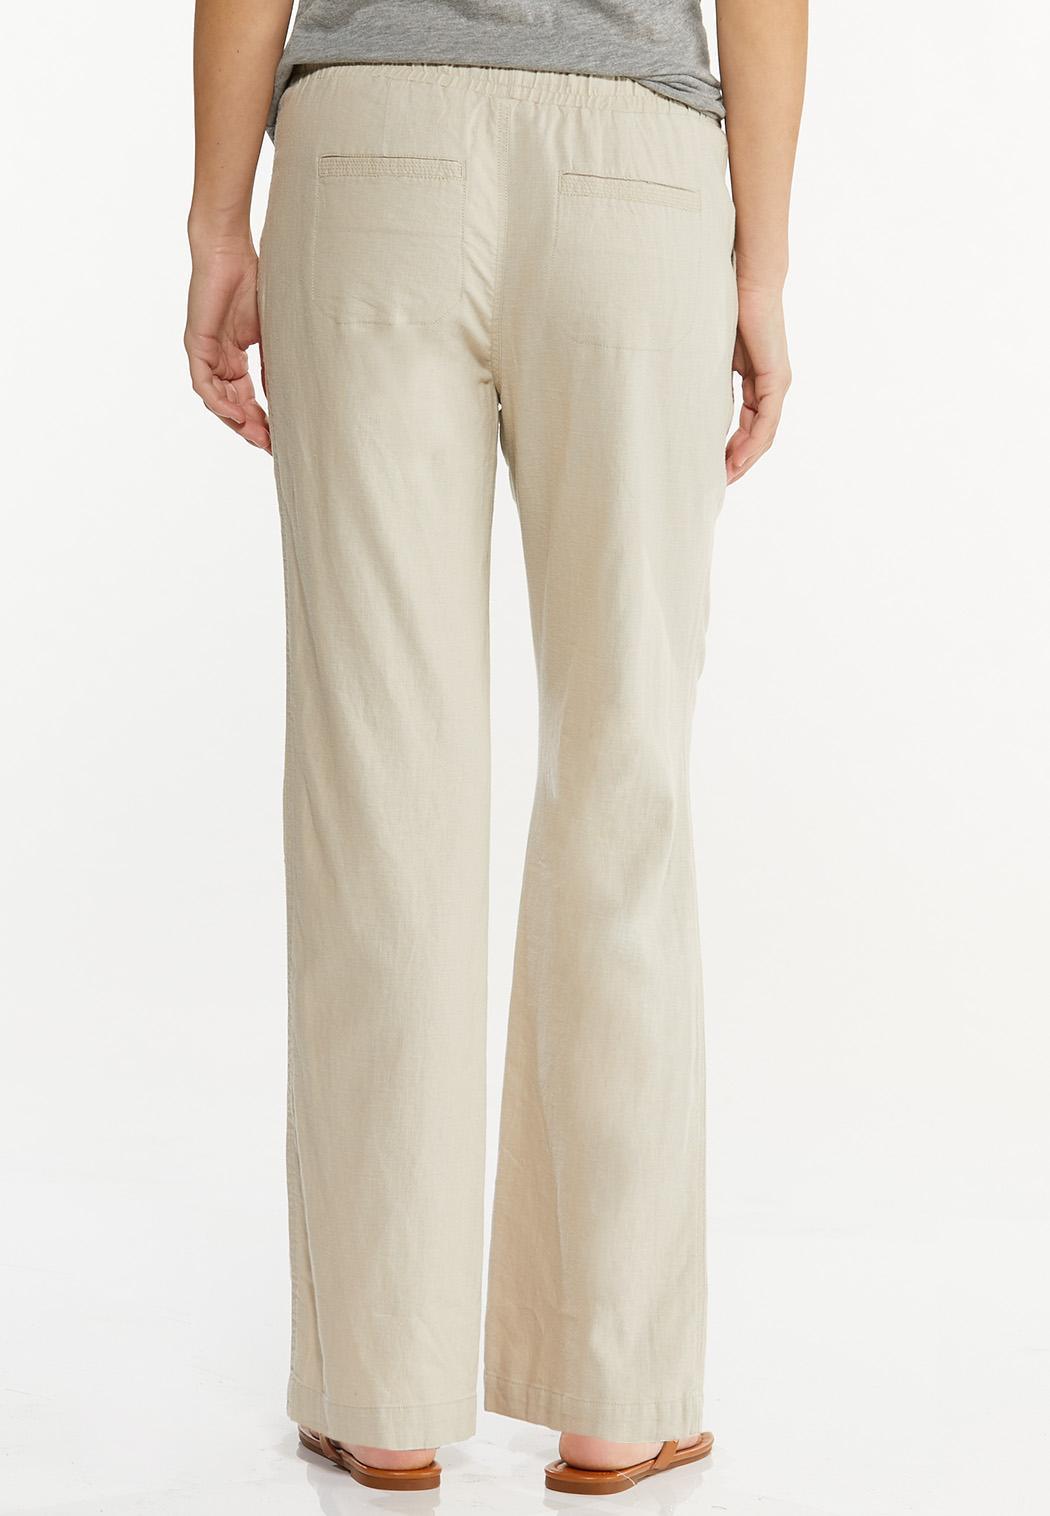 Petite Drawstring Linen Pants (Item #44569944)